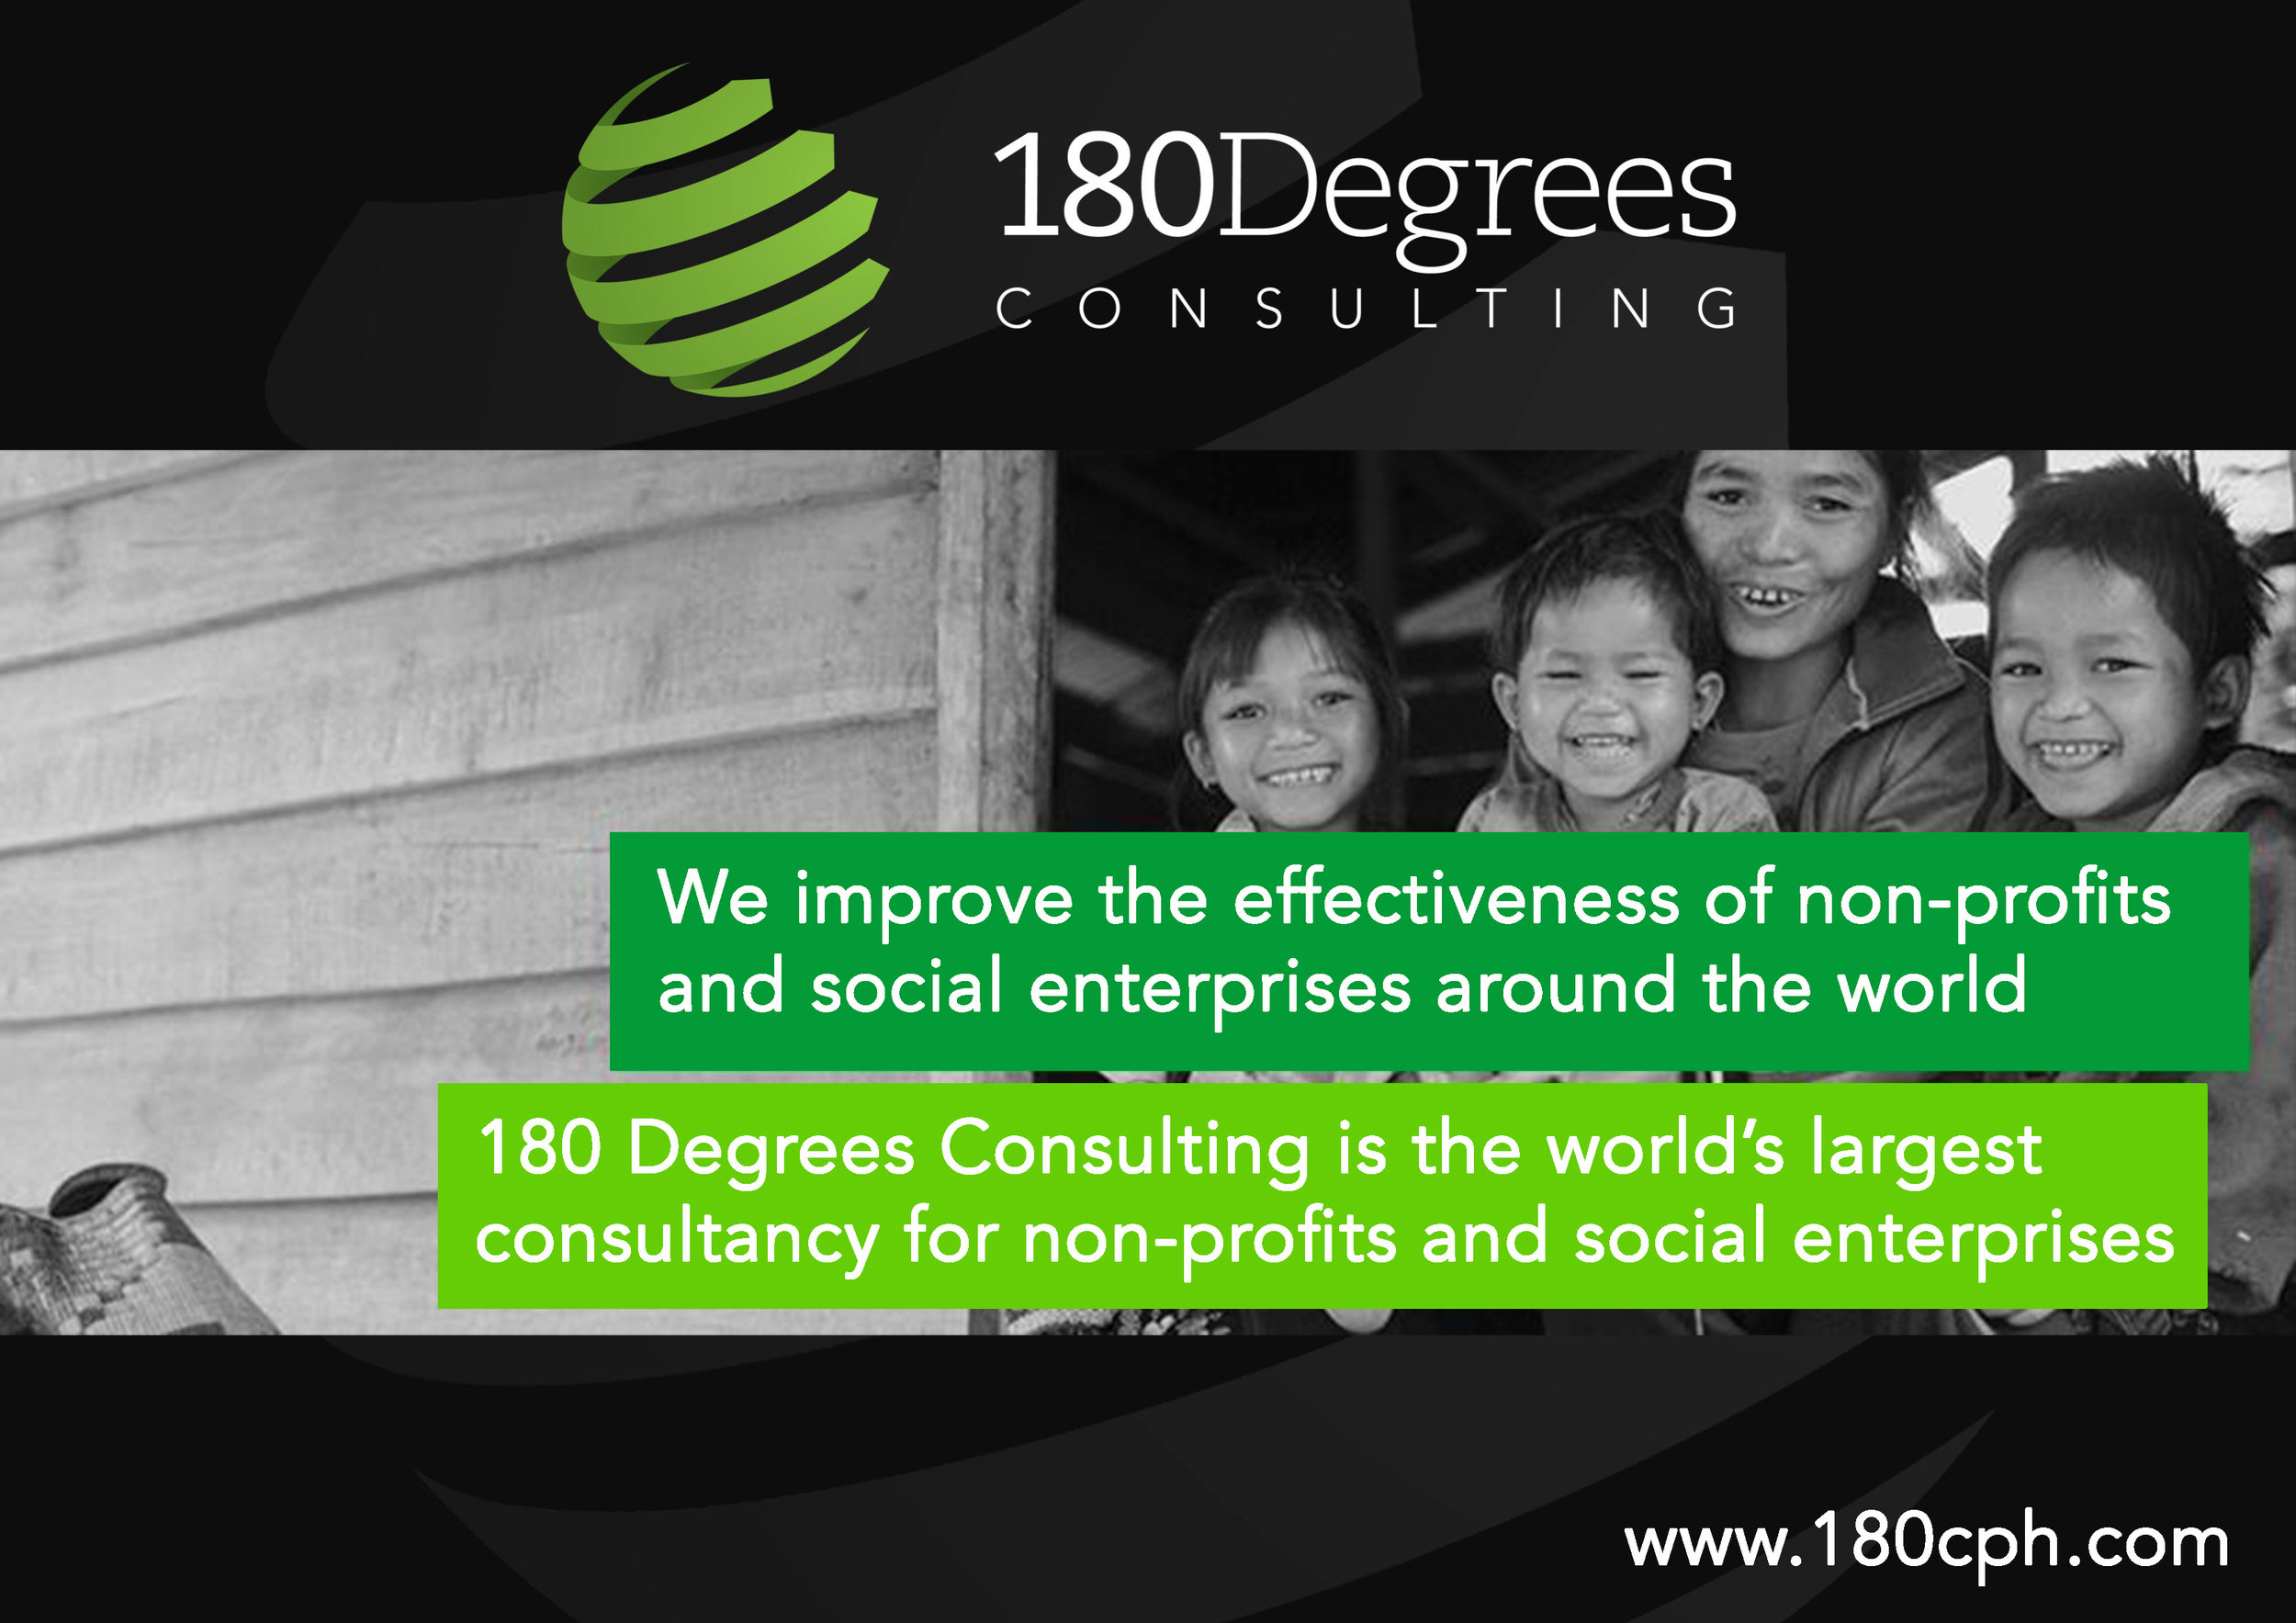 Get in touch - www.180dc.org/branch/copenhagen/Email: copenhagen@180dc.orgPhone: +(45) 28 51 10 09Facebook - Instagram - LinkedIn